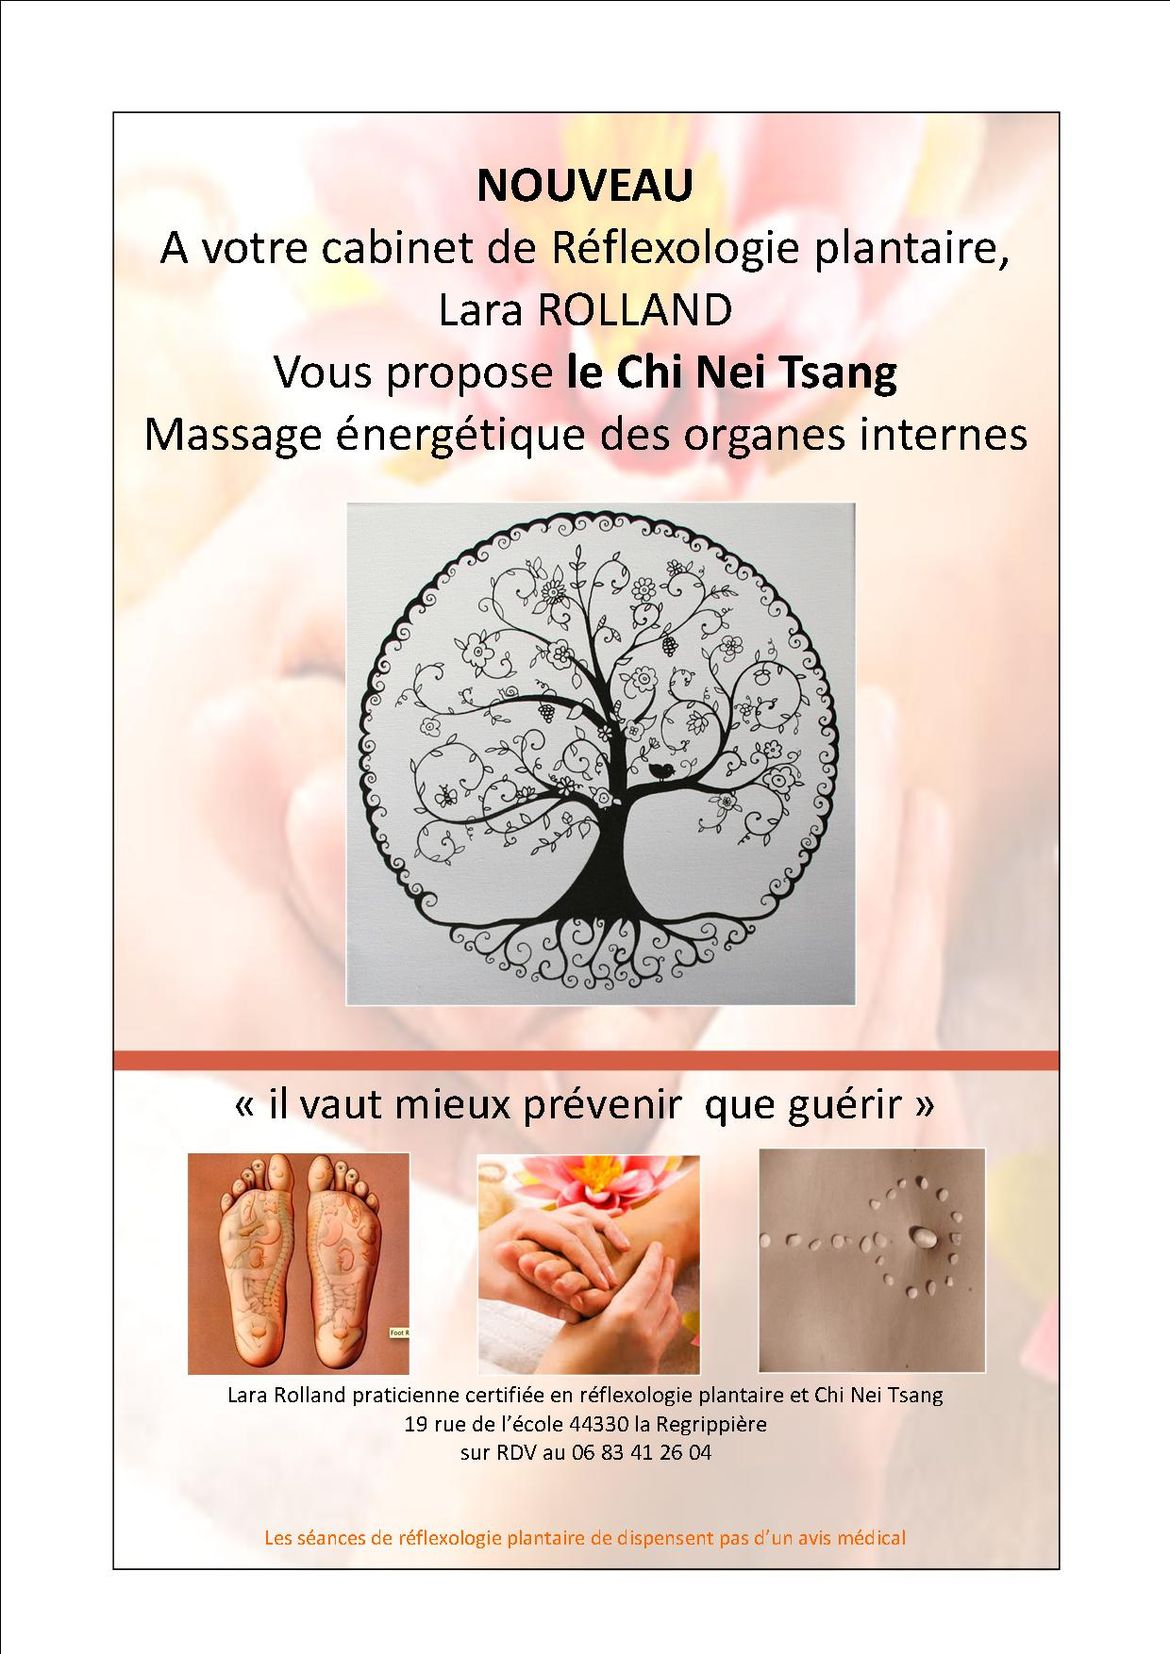 "Travailler l'énergie interne des organes"""